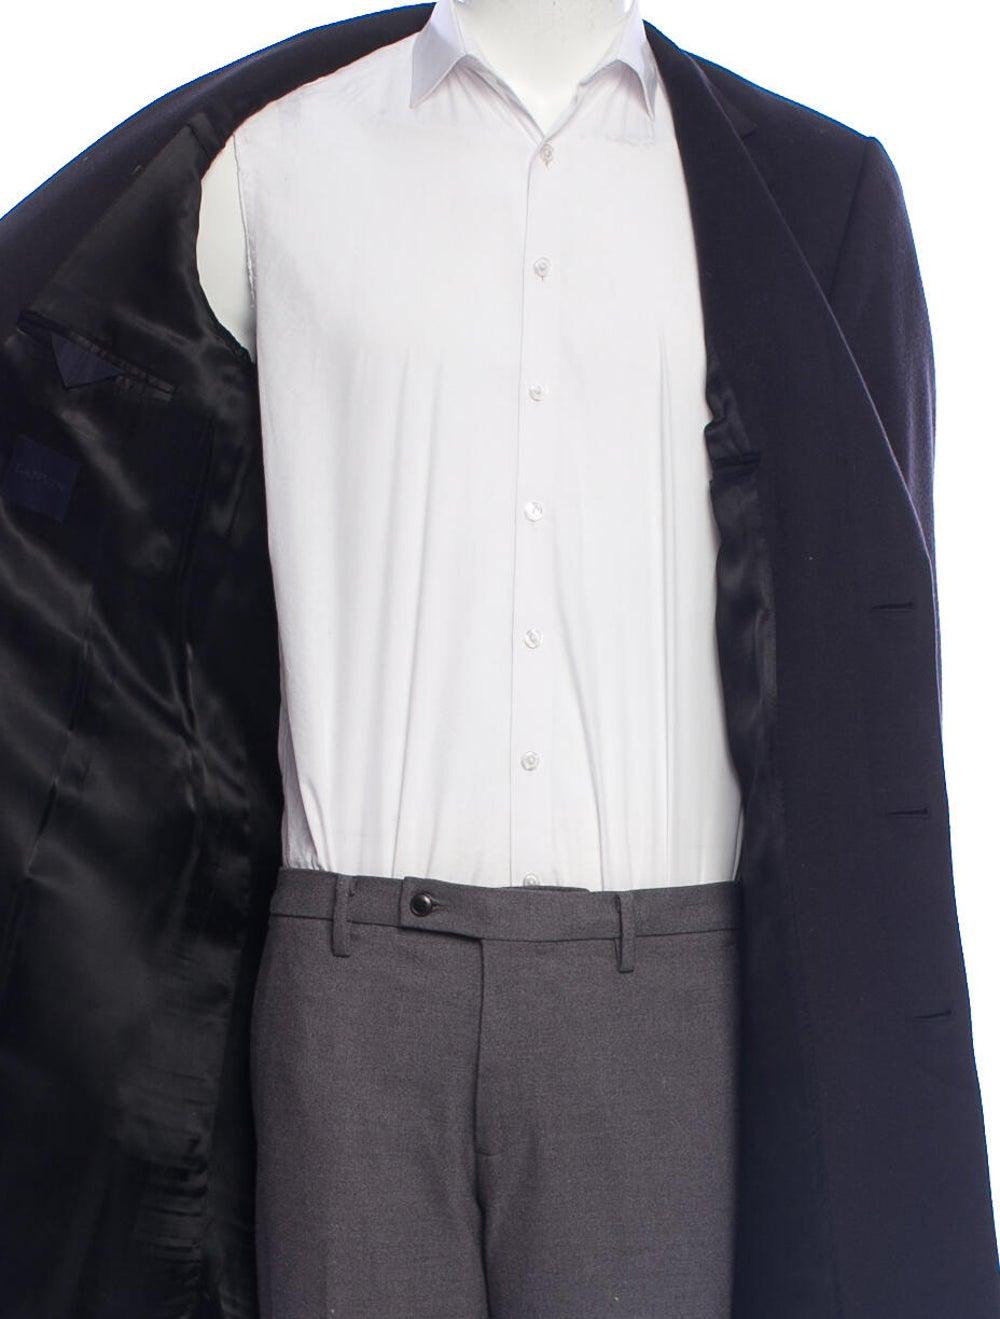 Lanvin Wool-Blend Overcoat black - image 4